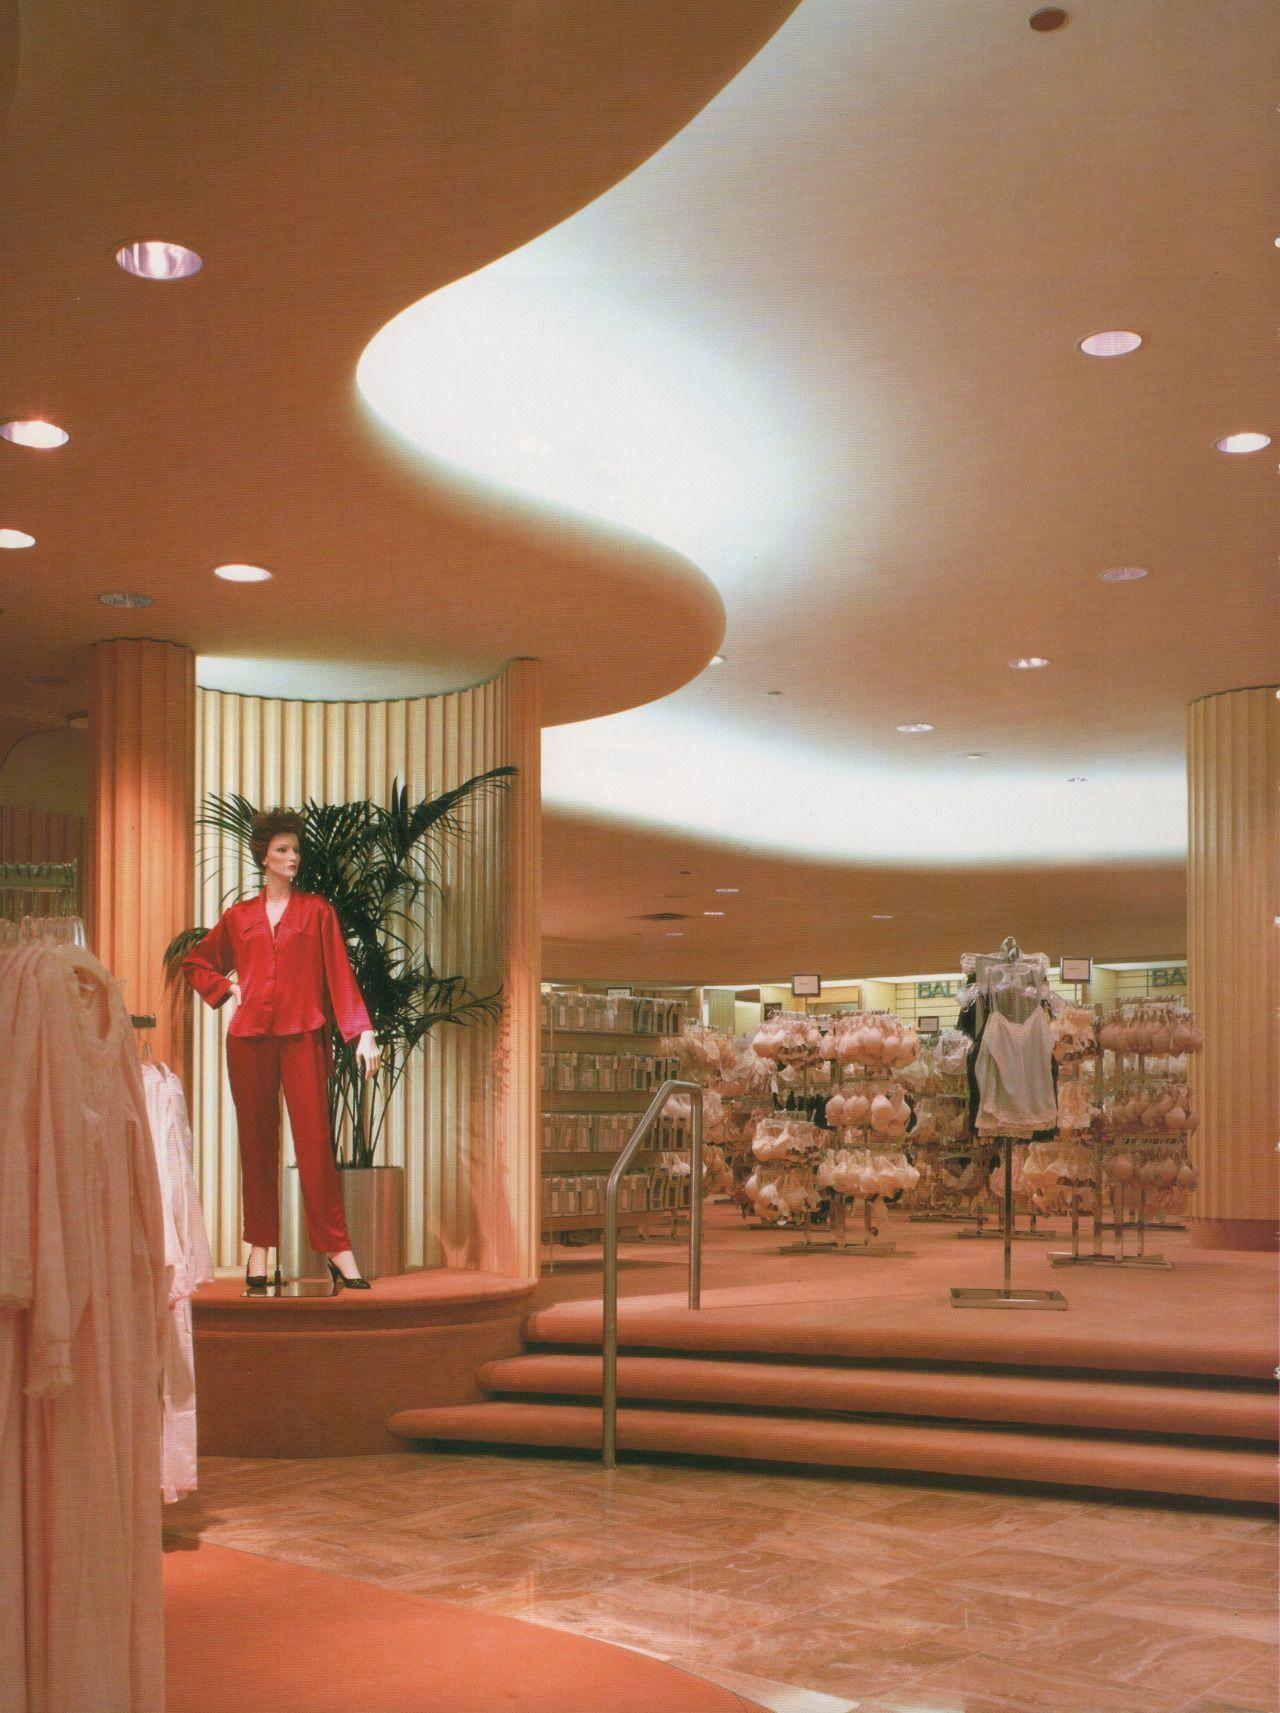 Palmandlaser Macyss Galleria Dallas Texas From The Best Of Designs 1987 Bestinteriordesignschools